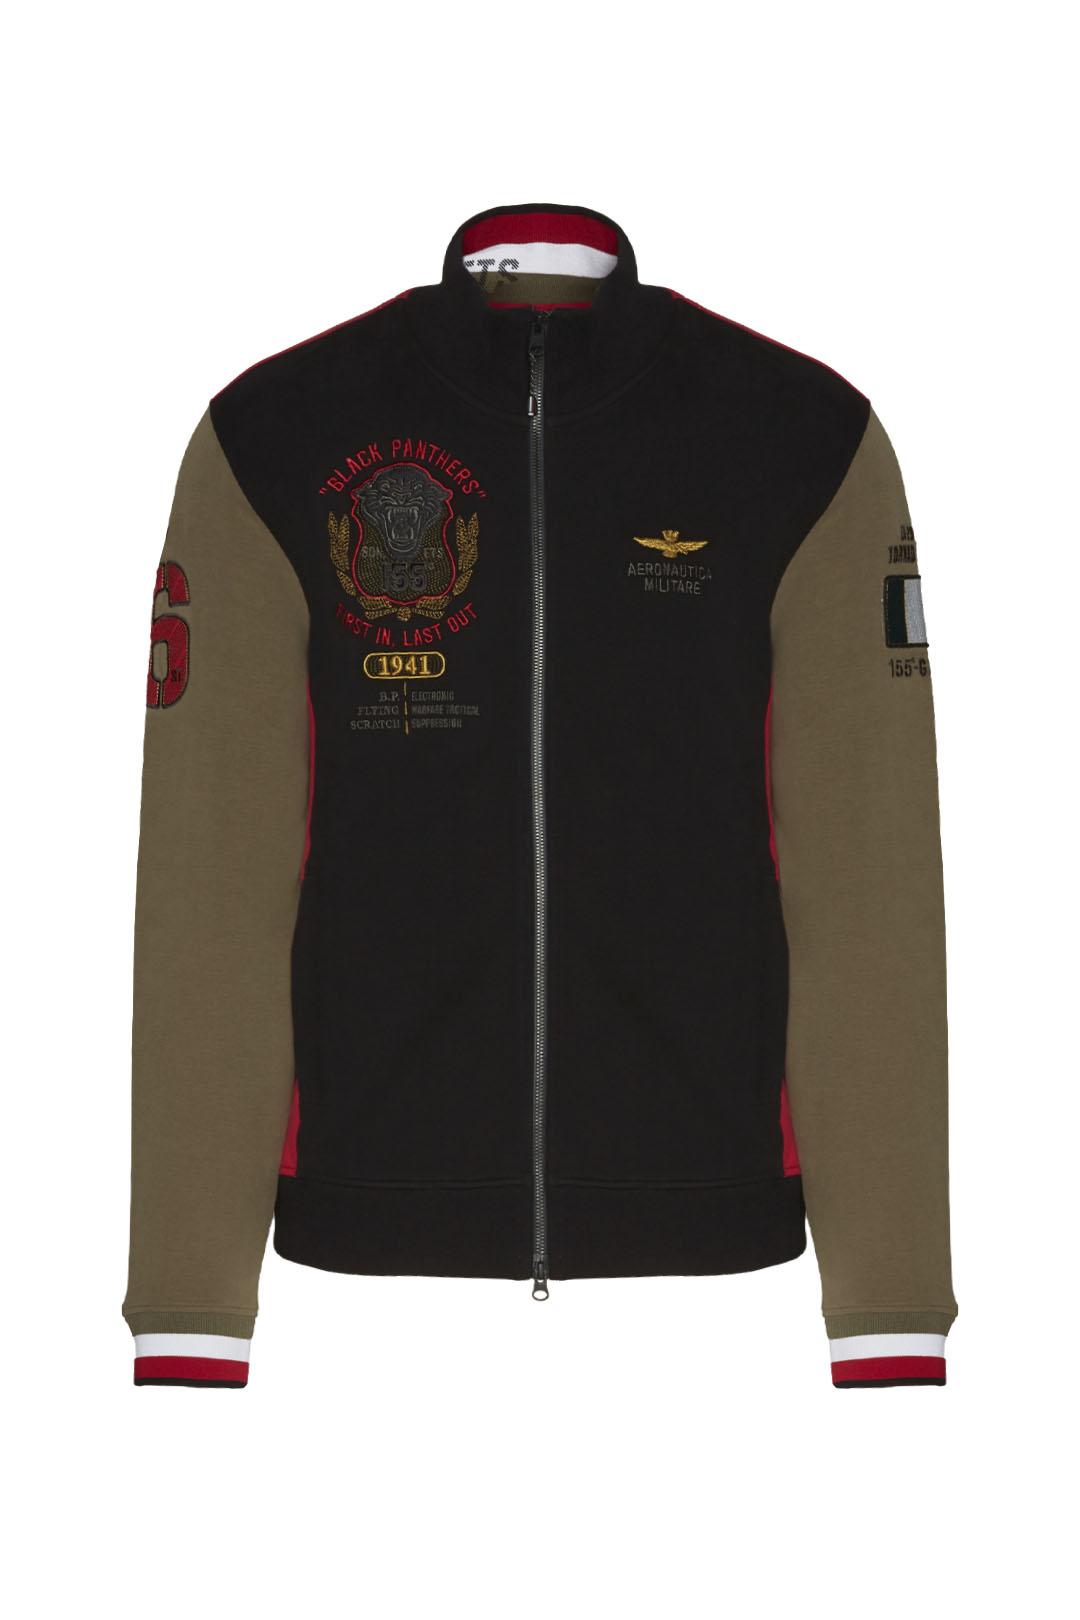 Sweatshirt 155° Gruppo Pantere Nere